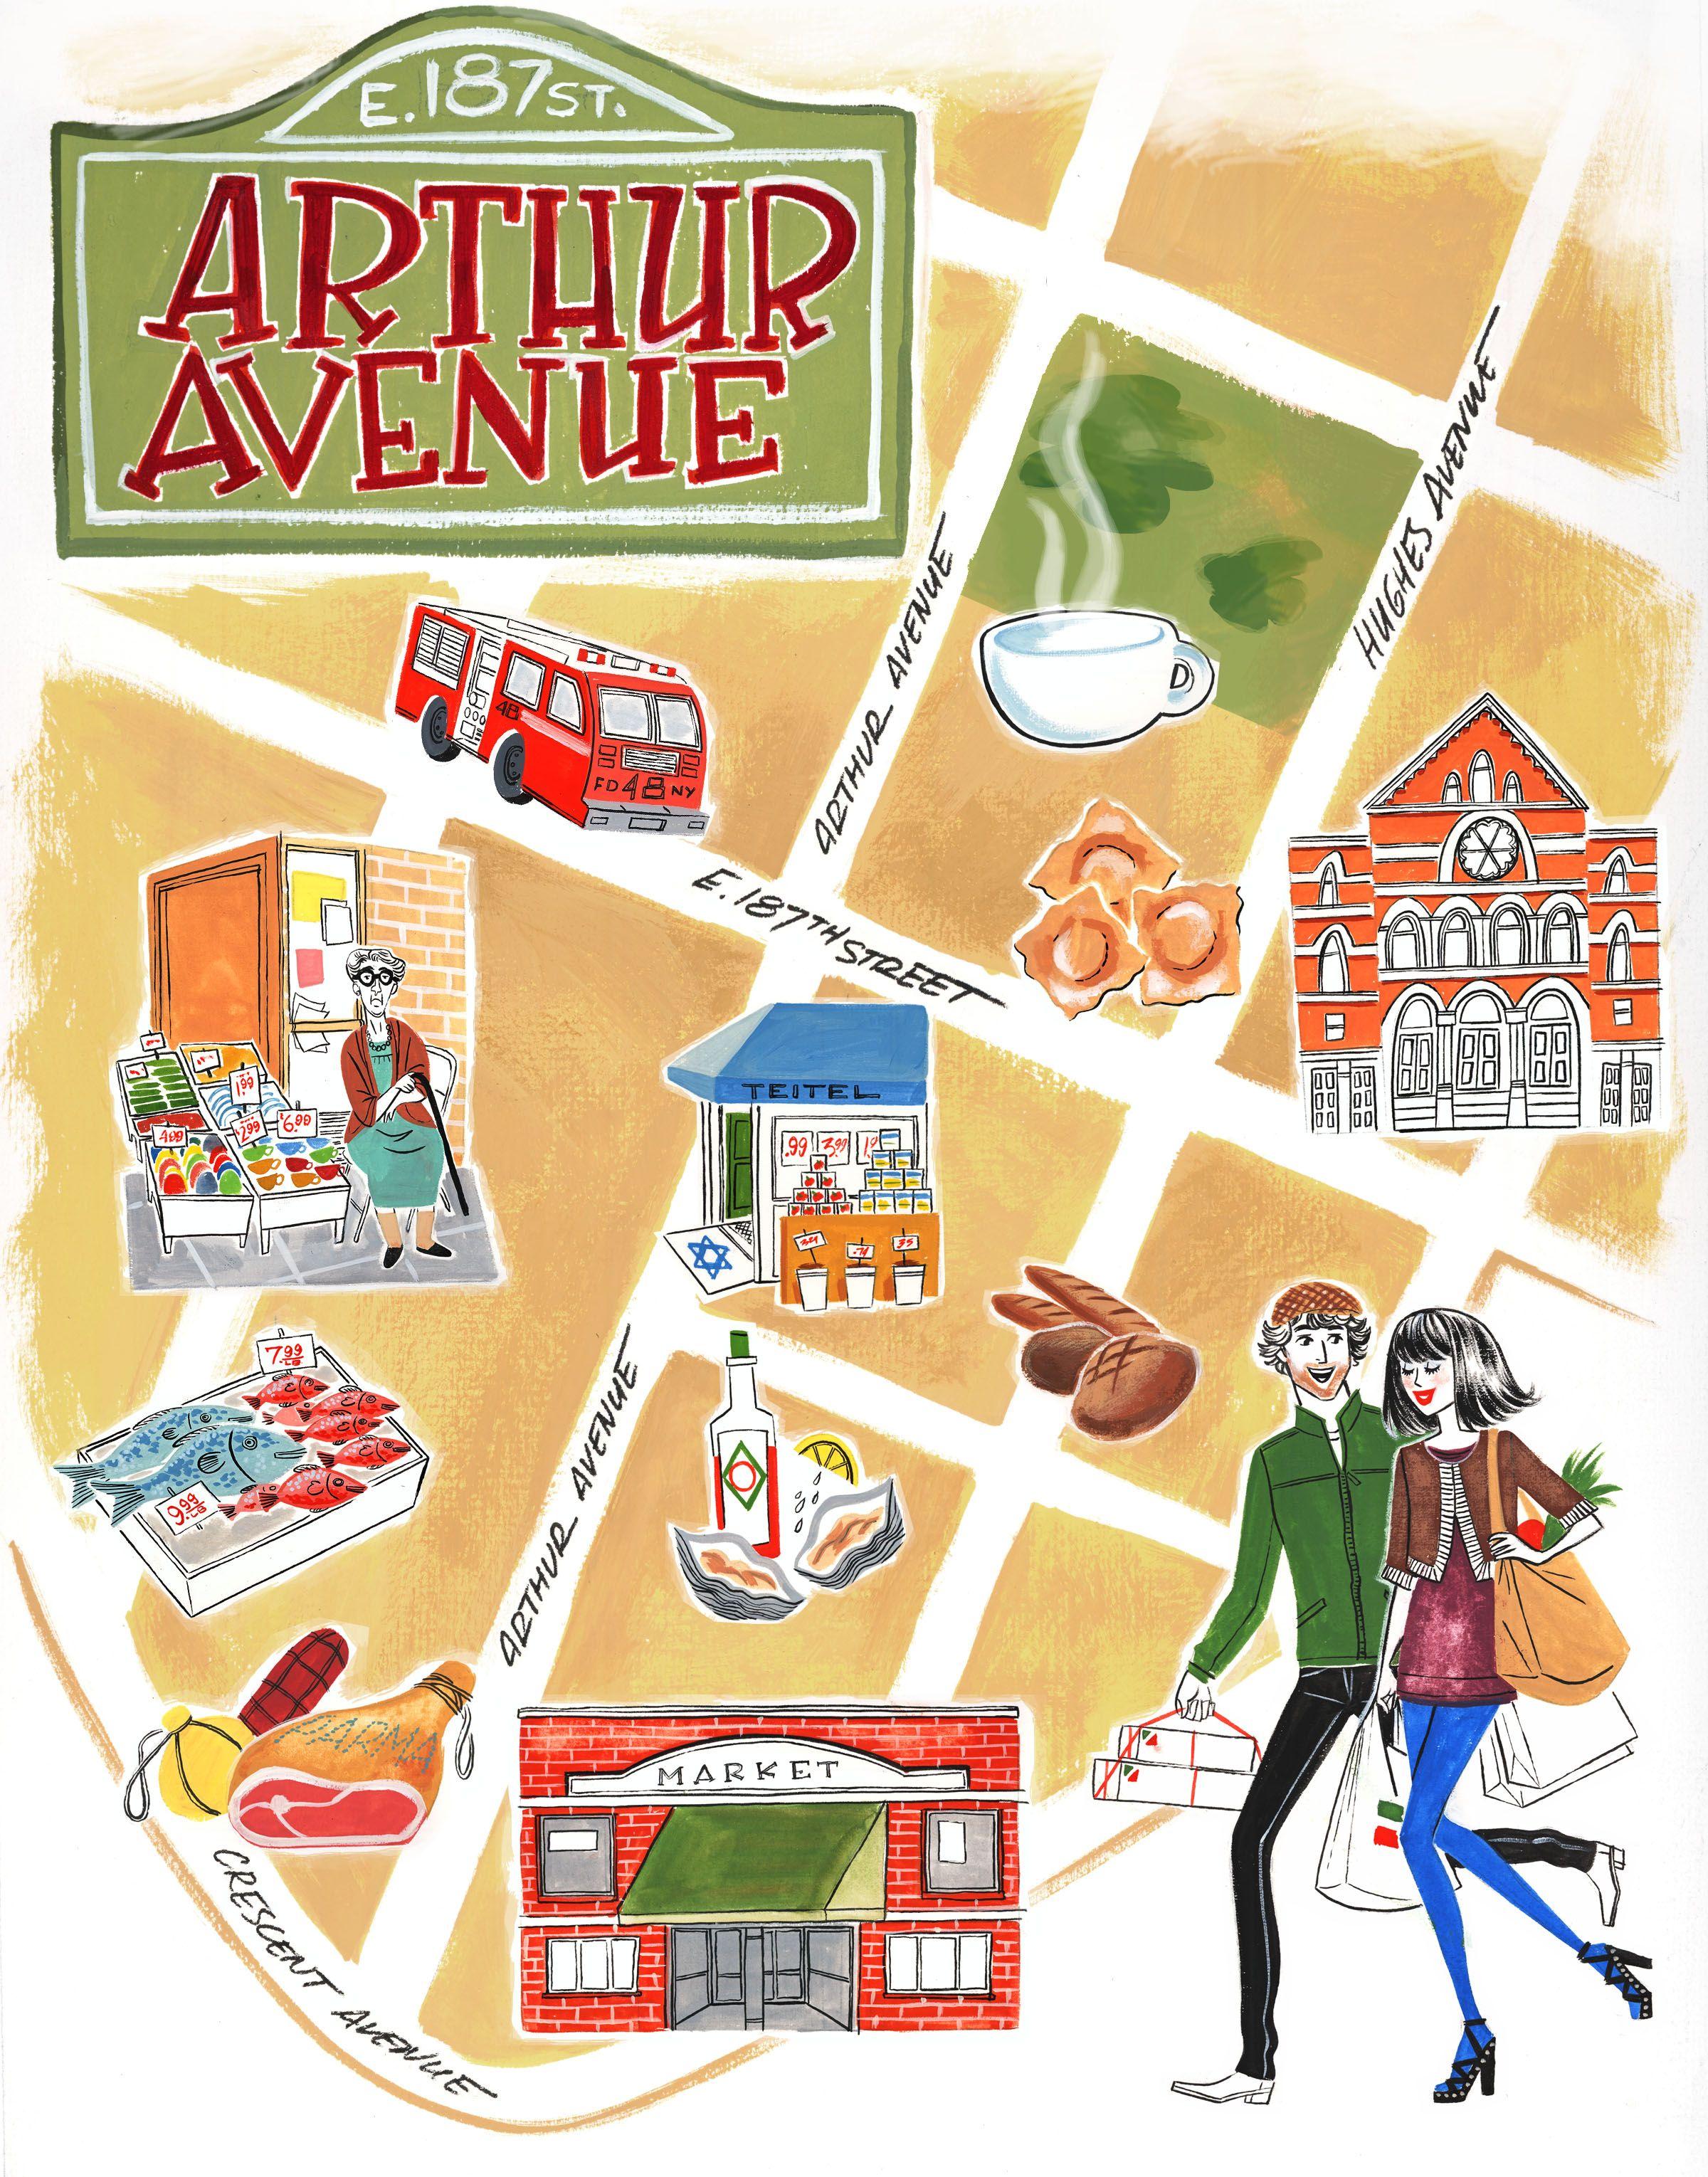 Arthur Avenue Little Italy Map New York By Marilena Perilli